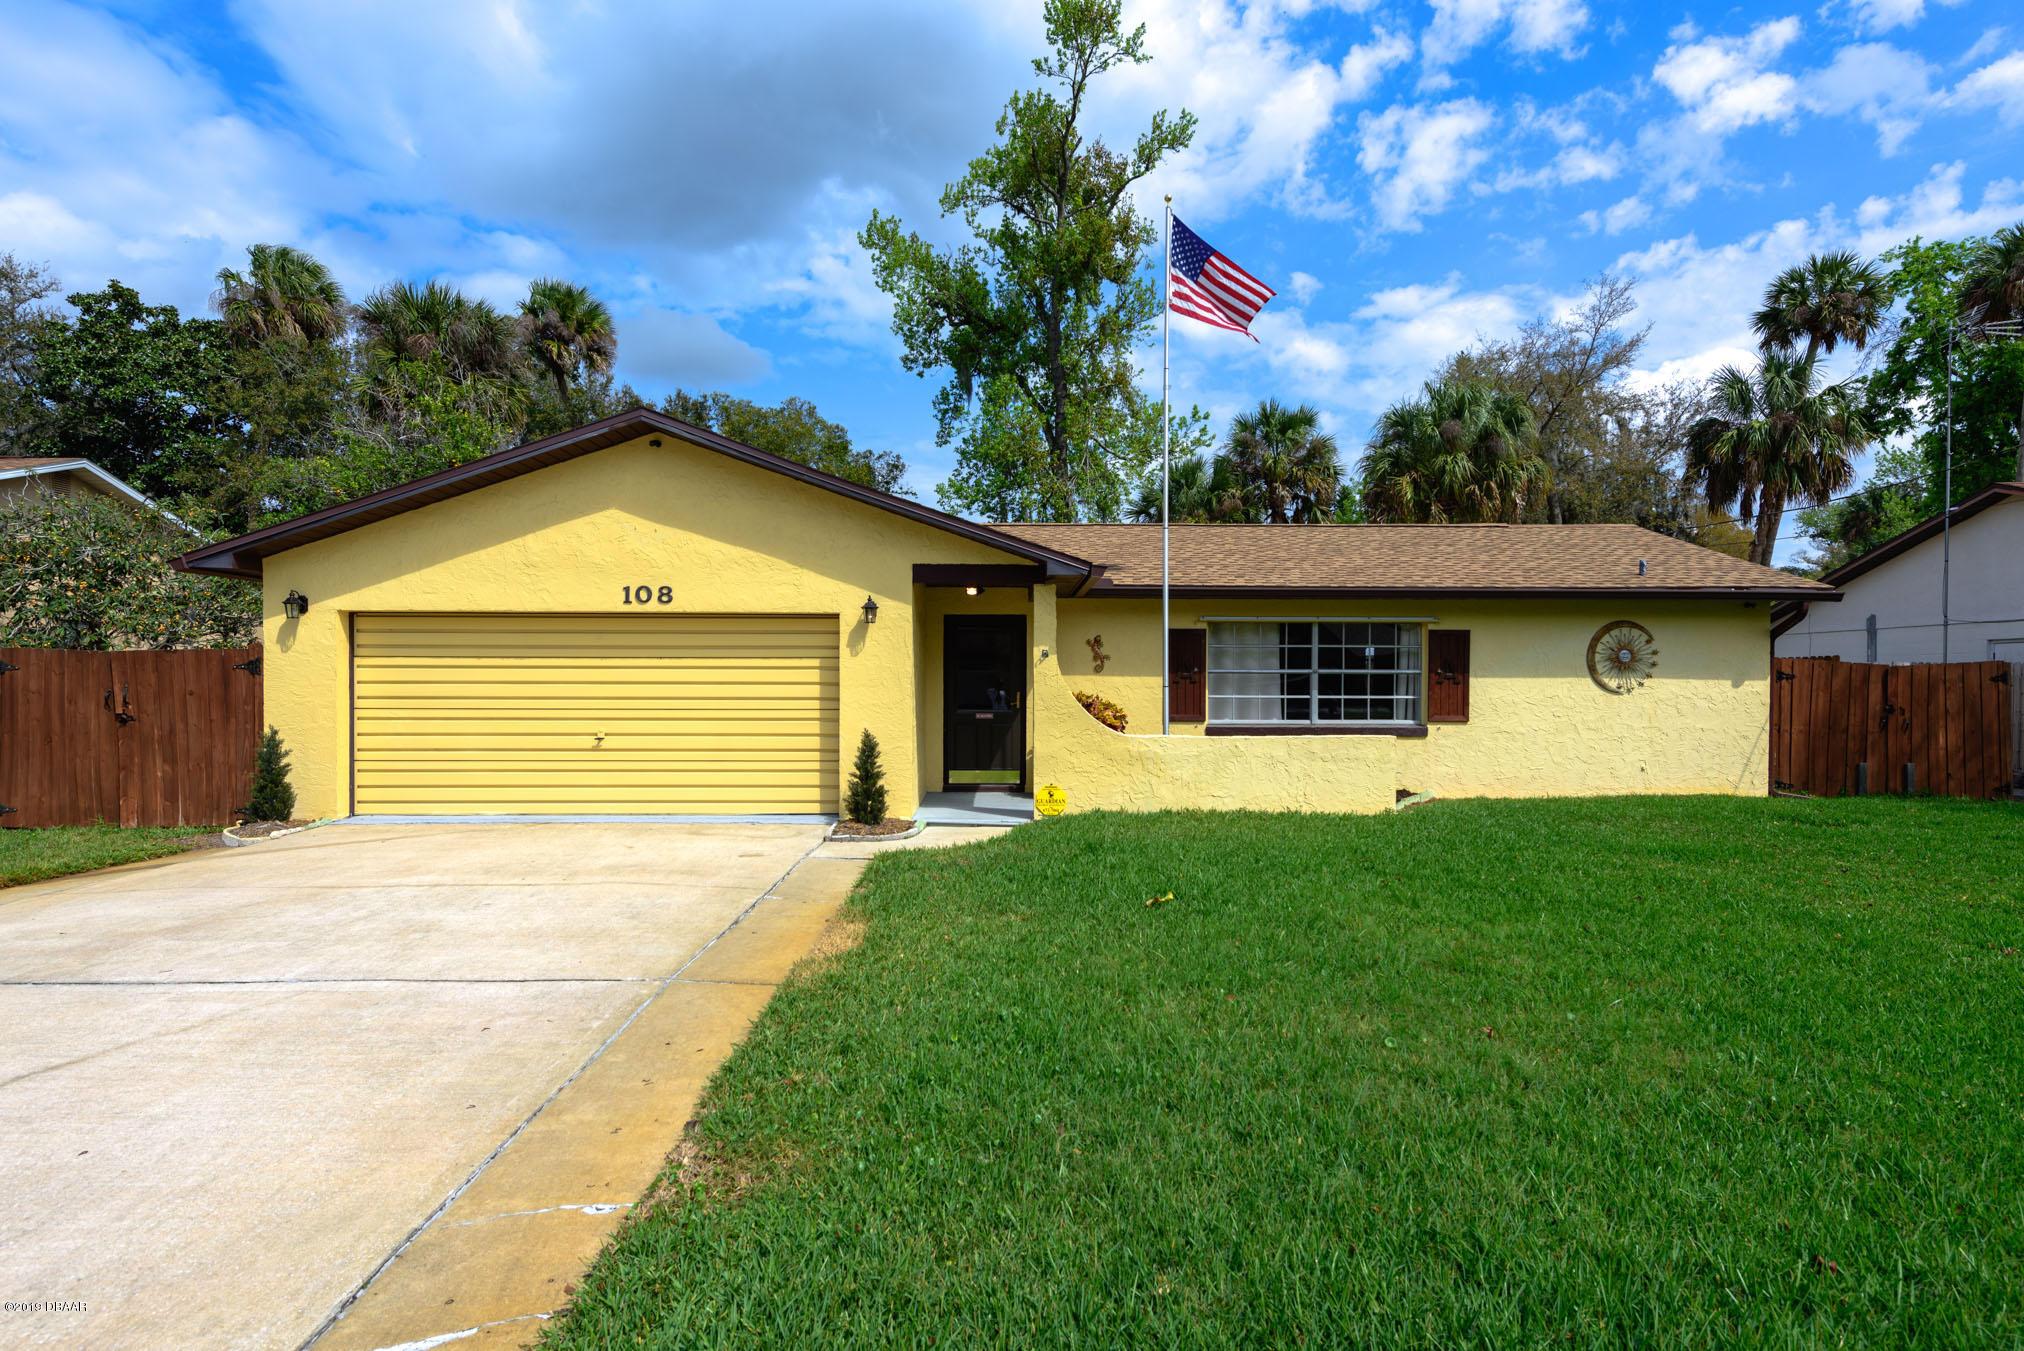 108  Camino Circle, Ormond Beach in Volusia County, FL 32174 Home for Sale